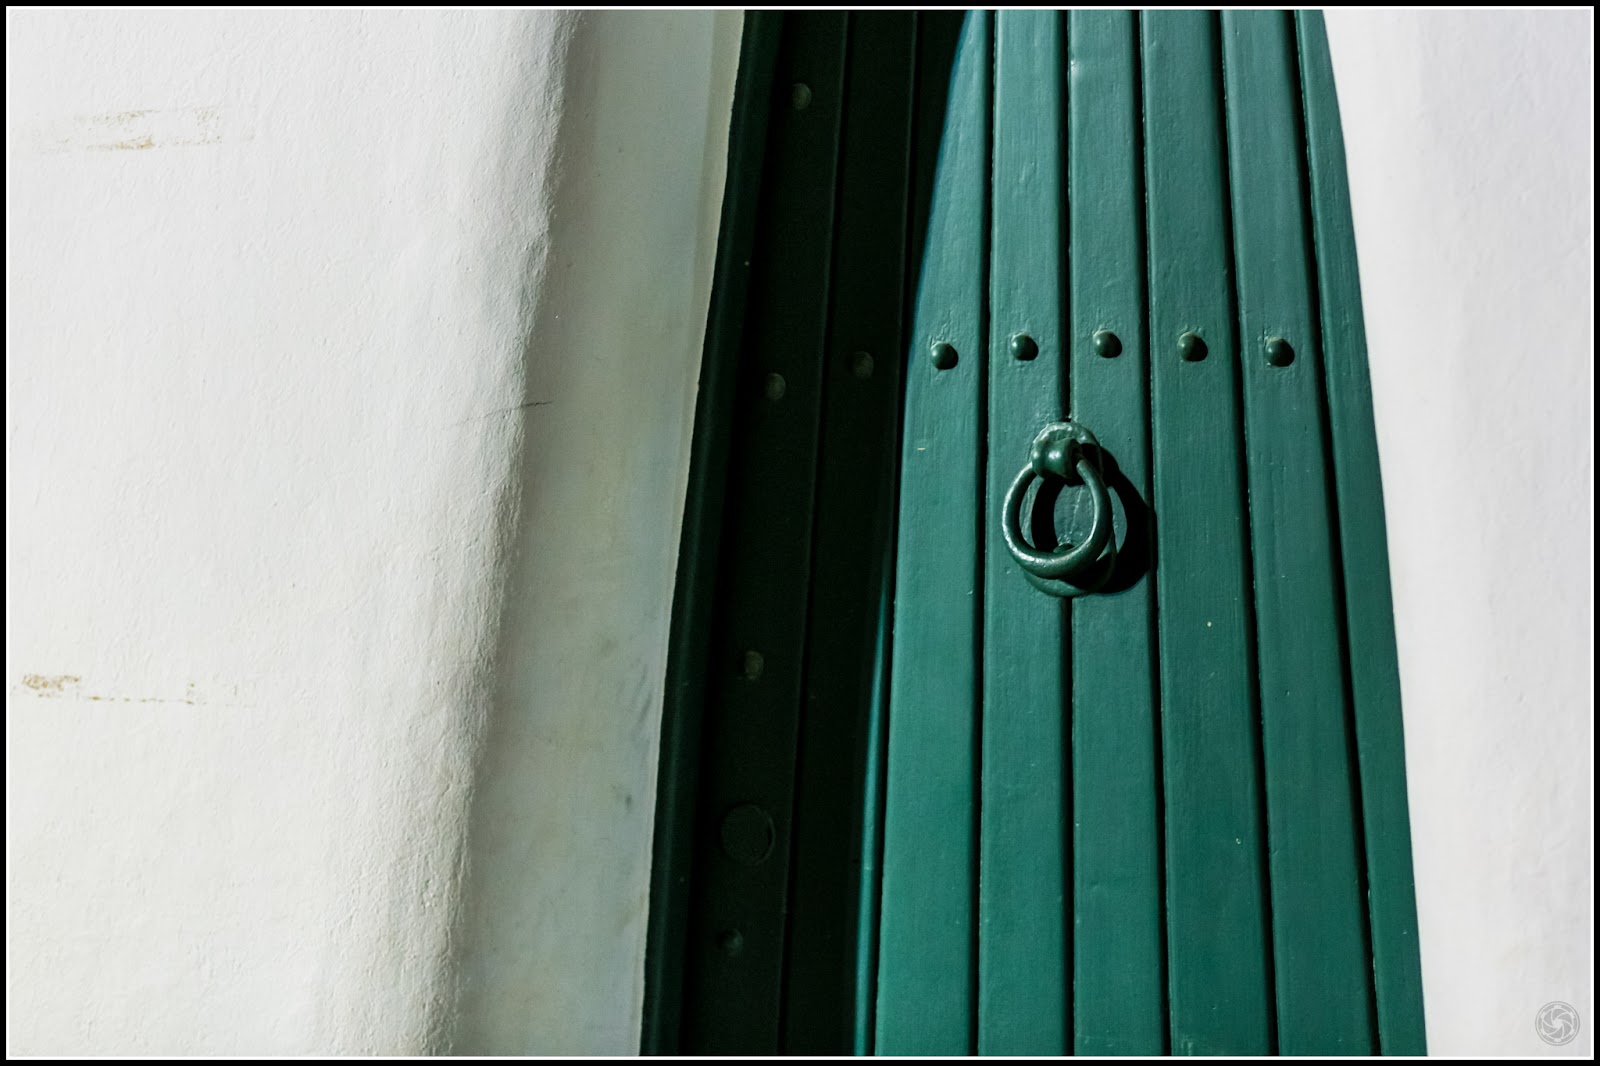 Puerta :: Canon EOS 5D MkIII | ISO3200 | Canon 85mm | f/2.8 | 1/50s